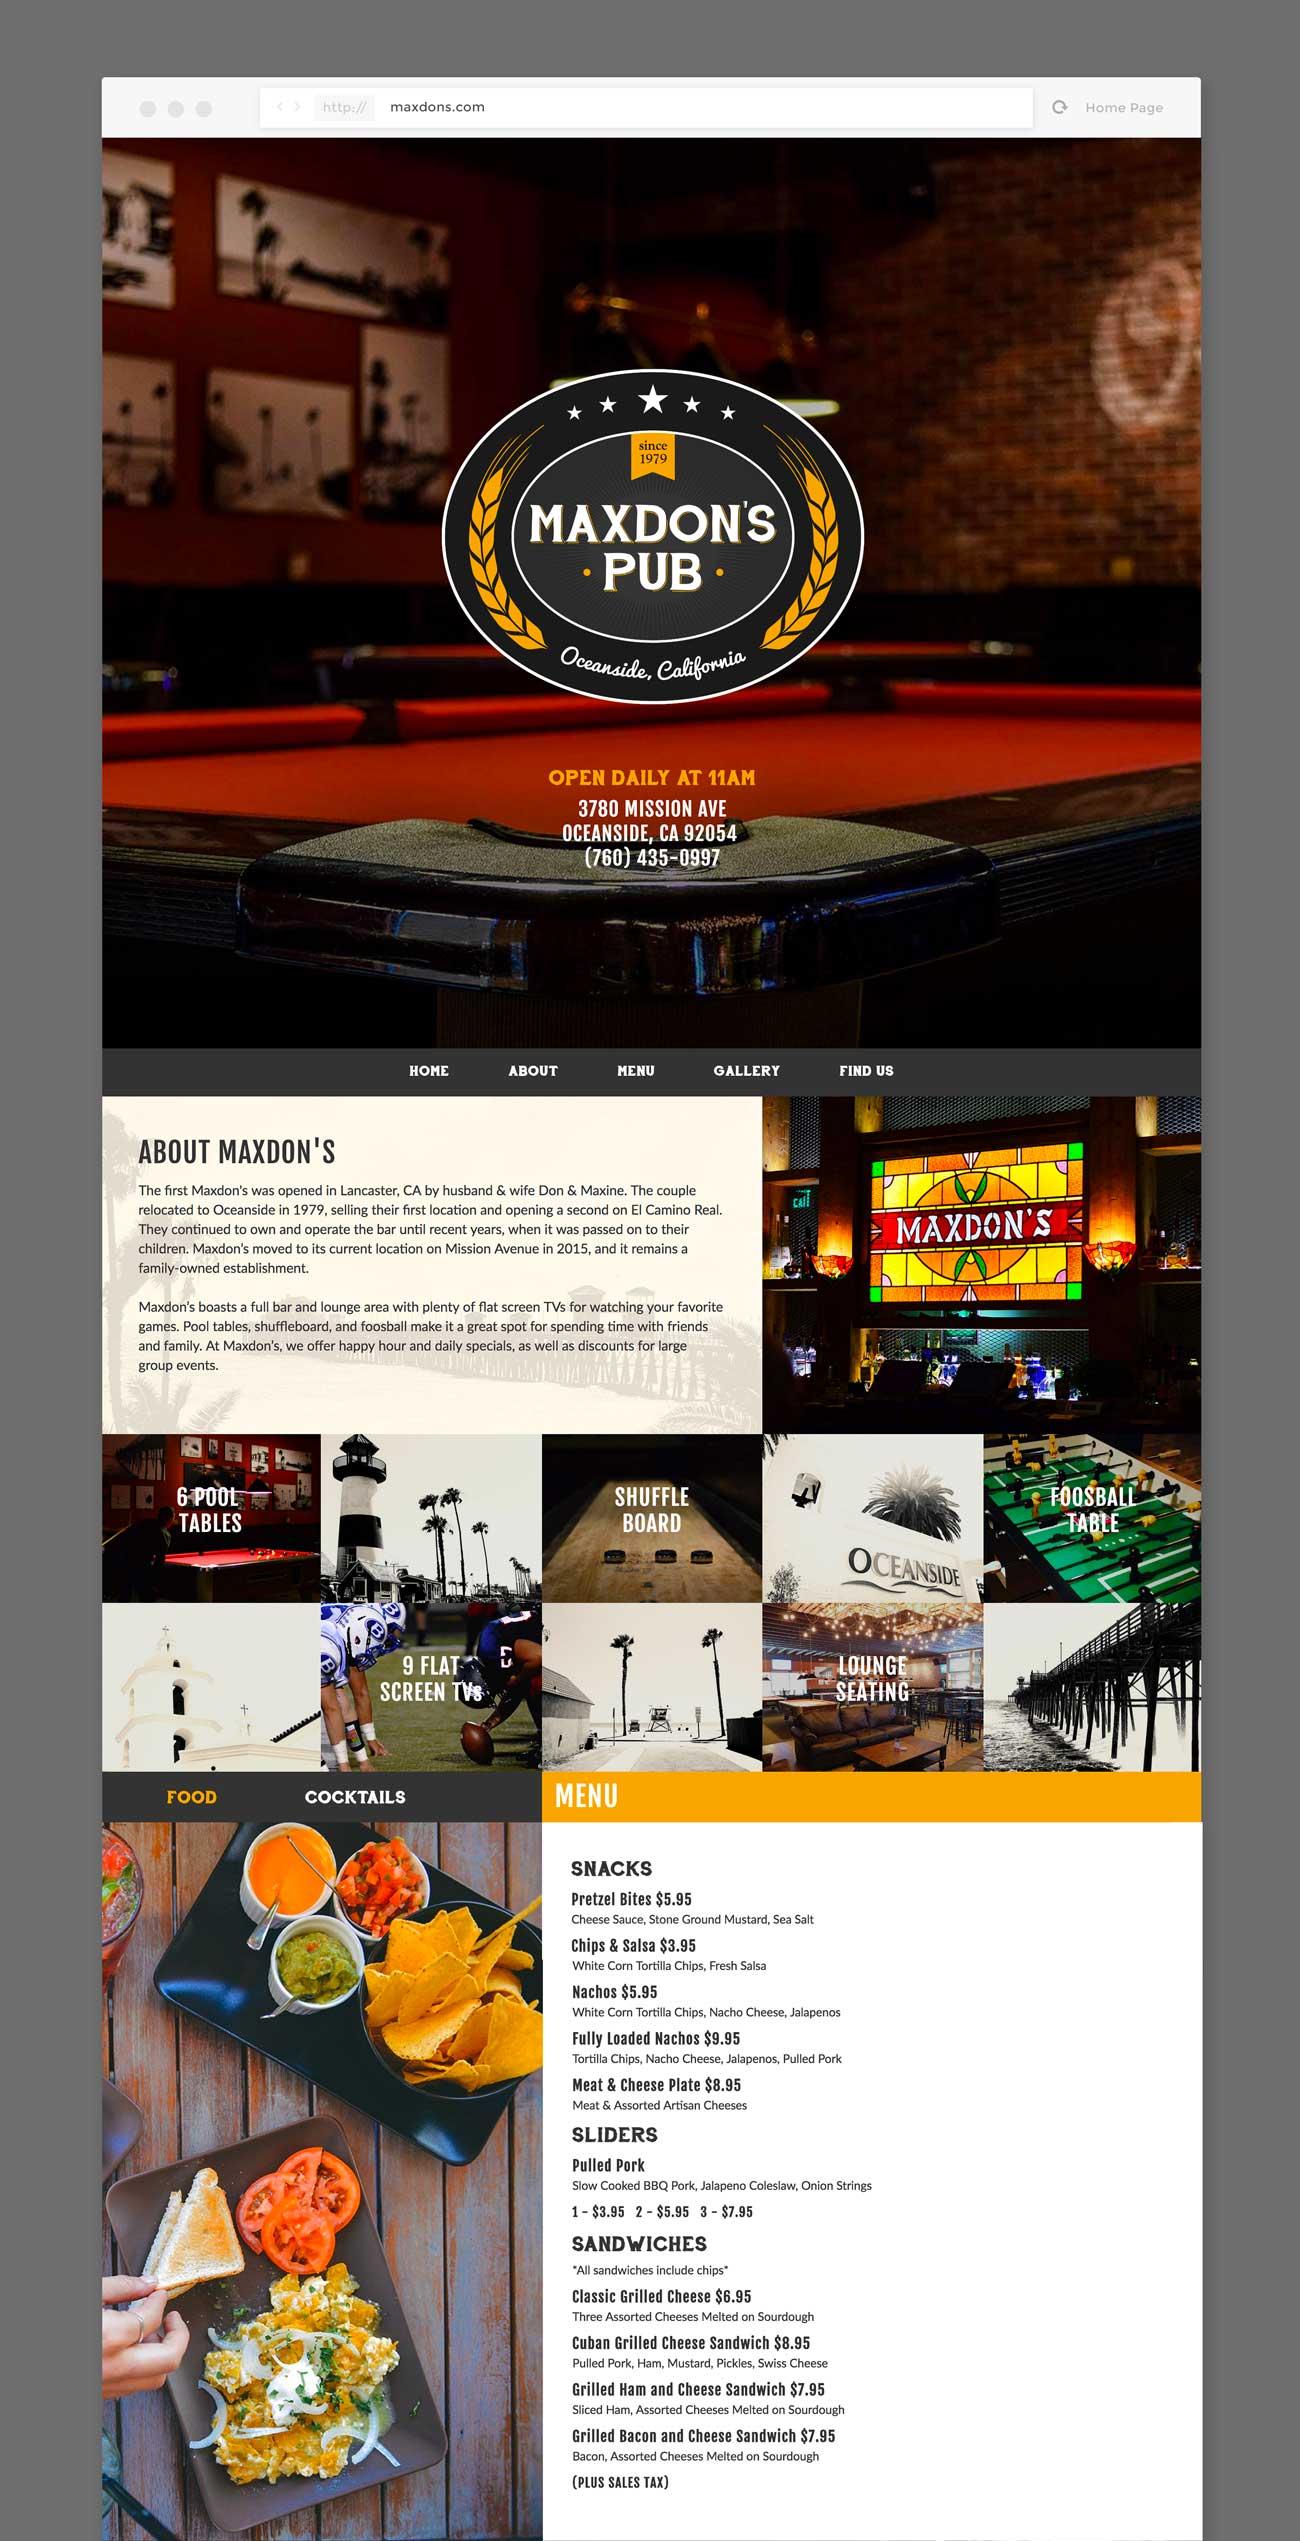 Screenshot of the Maxdon's Pub homepage.